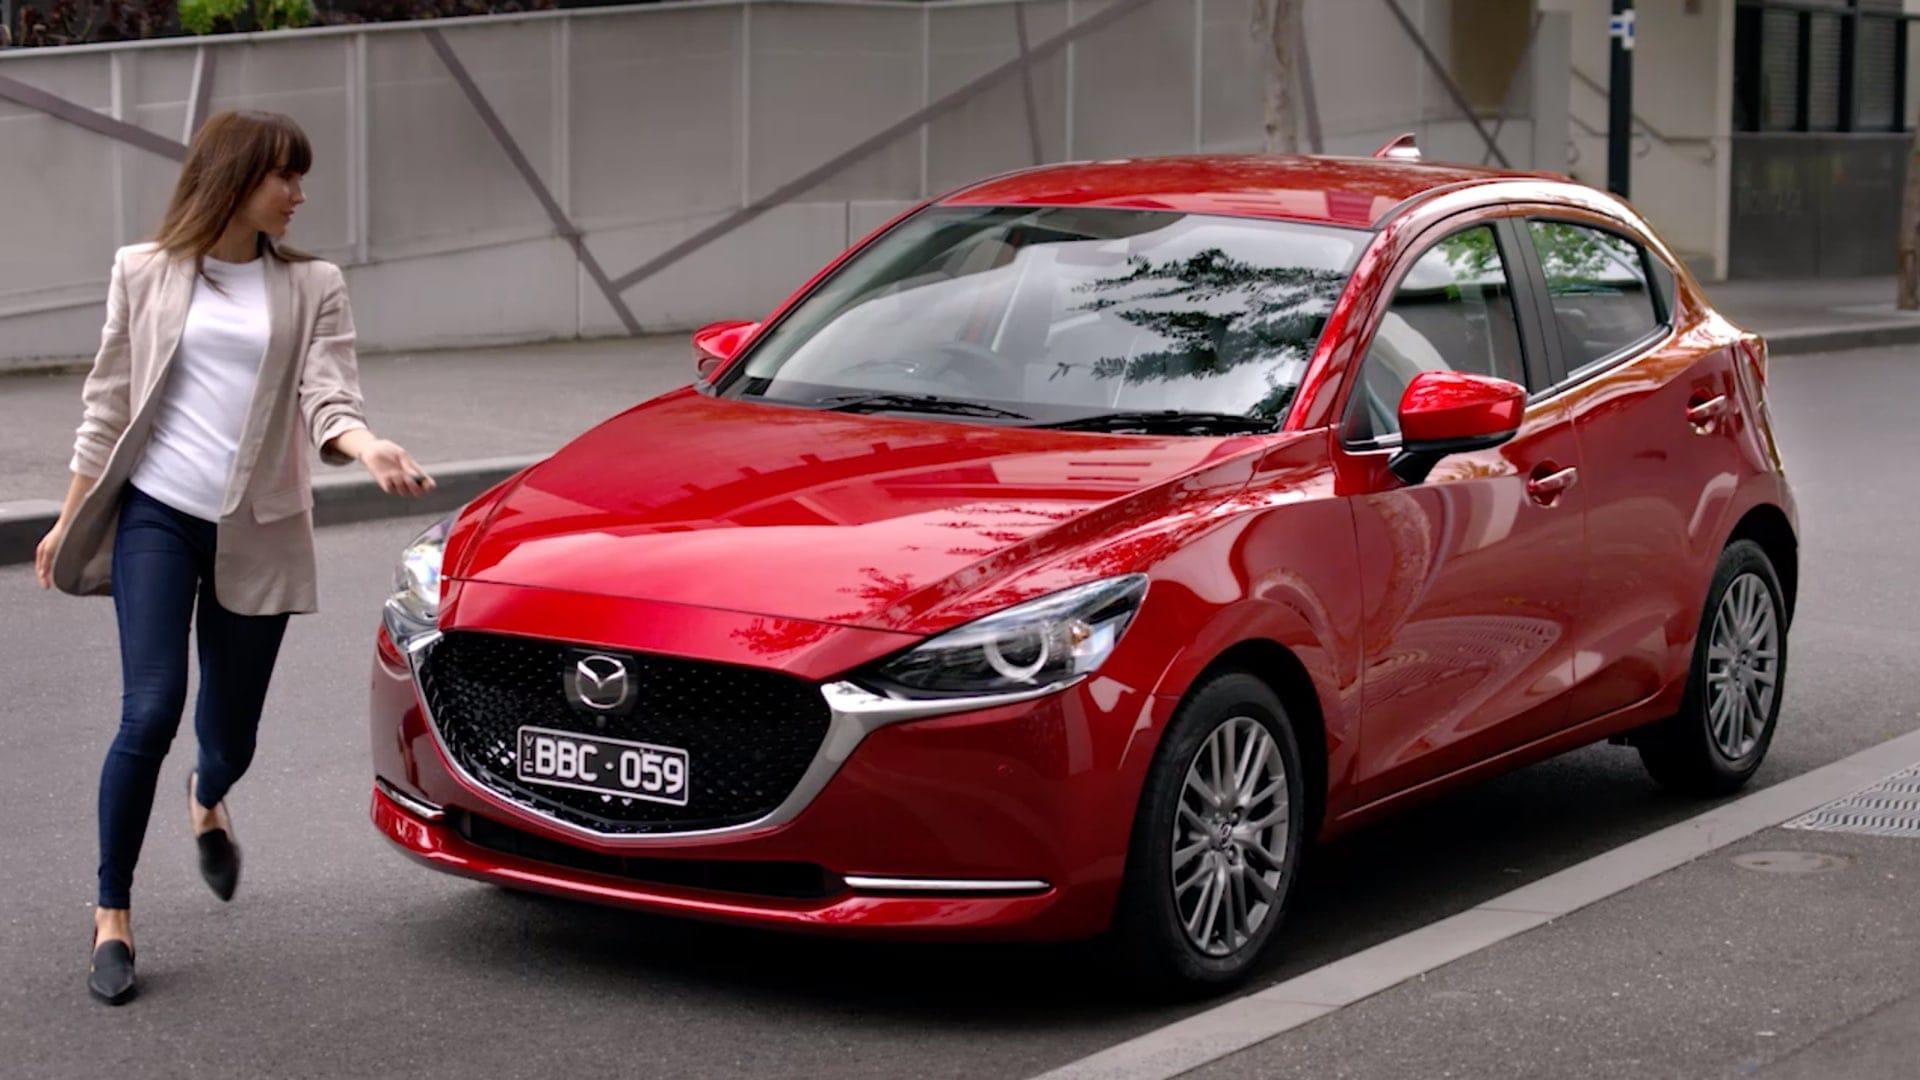 Kelebihan Kekurangan Mazda 2 Murah Berkualitas